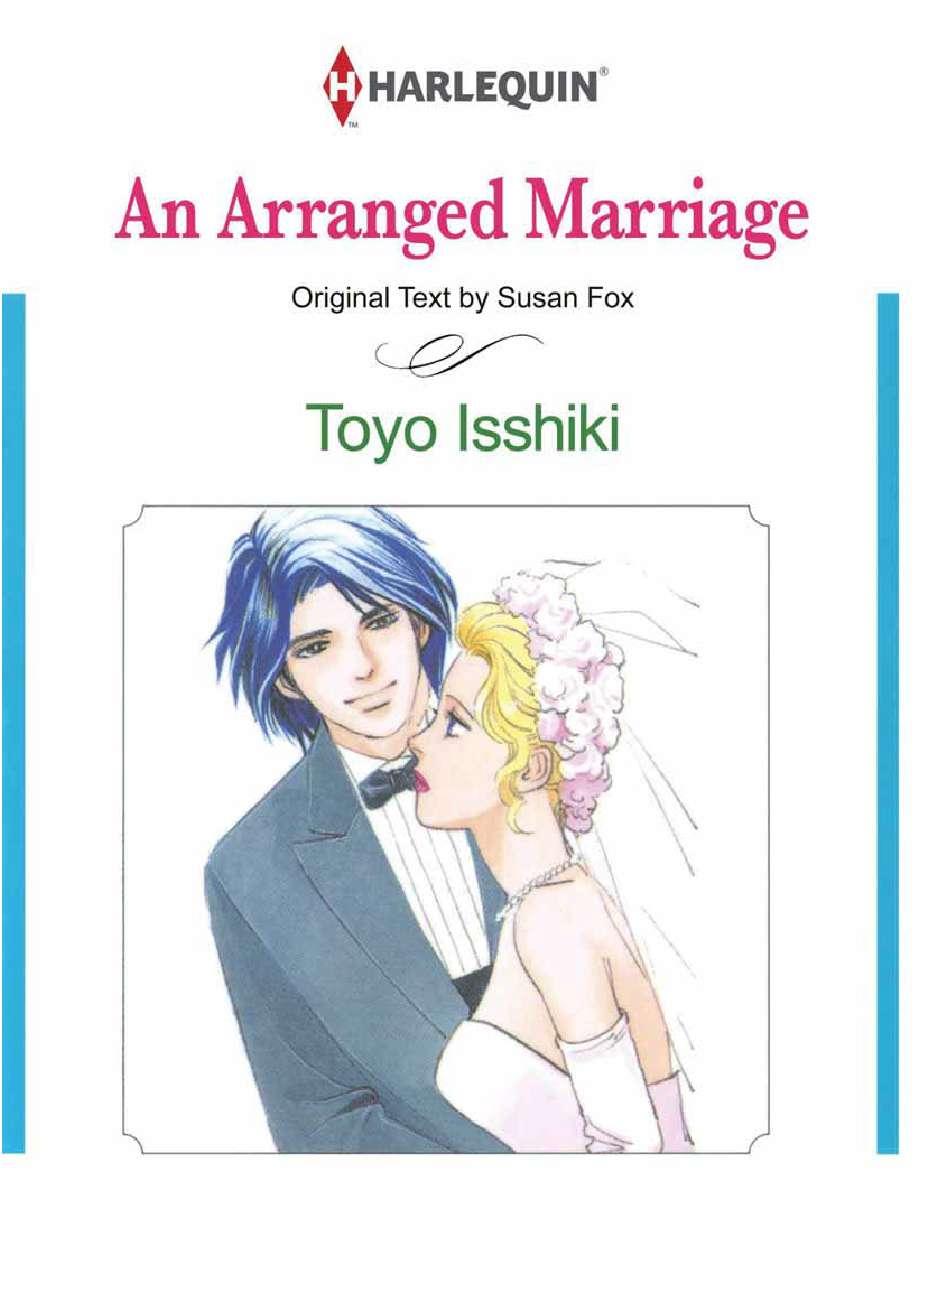 An Arranged Marriage Book by Susan Fox - Gramedia Digital